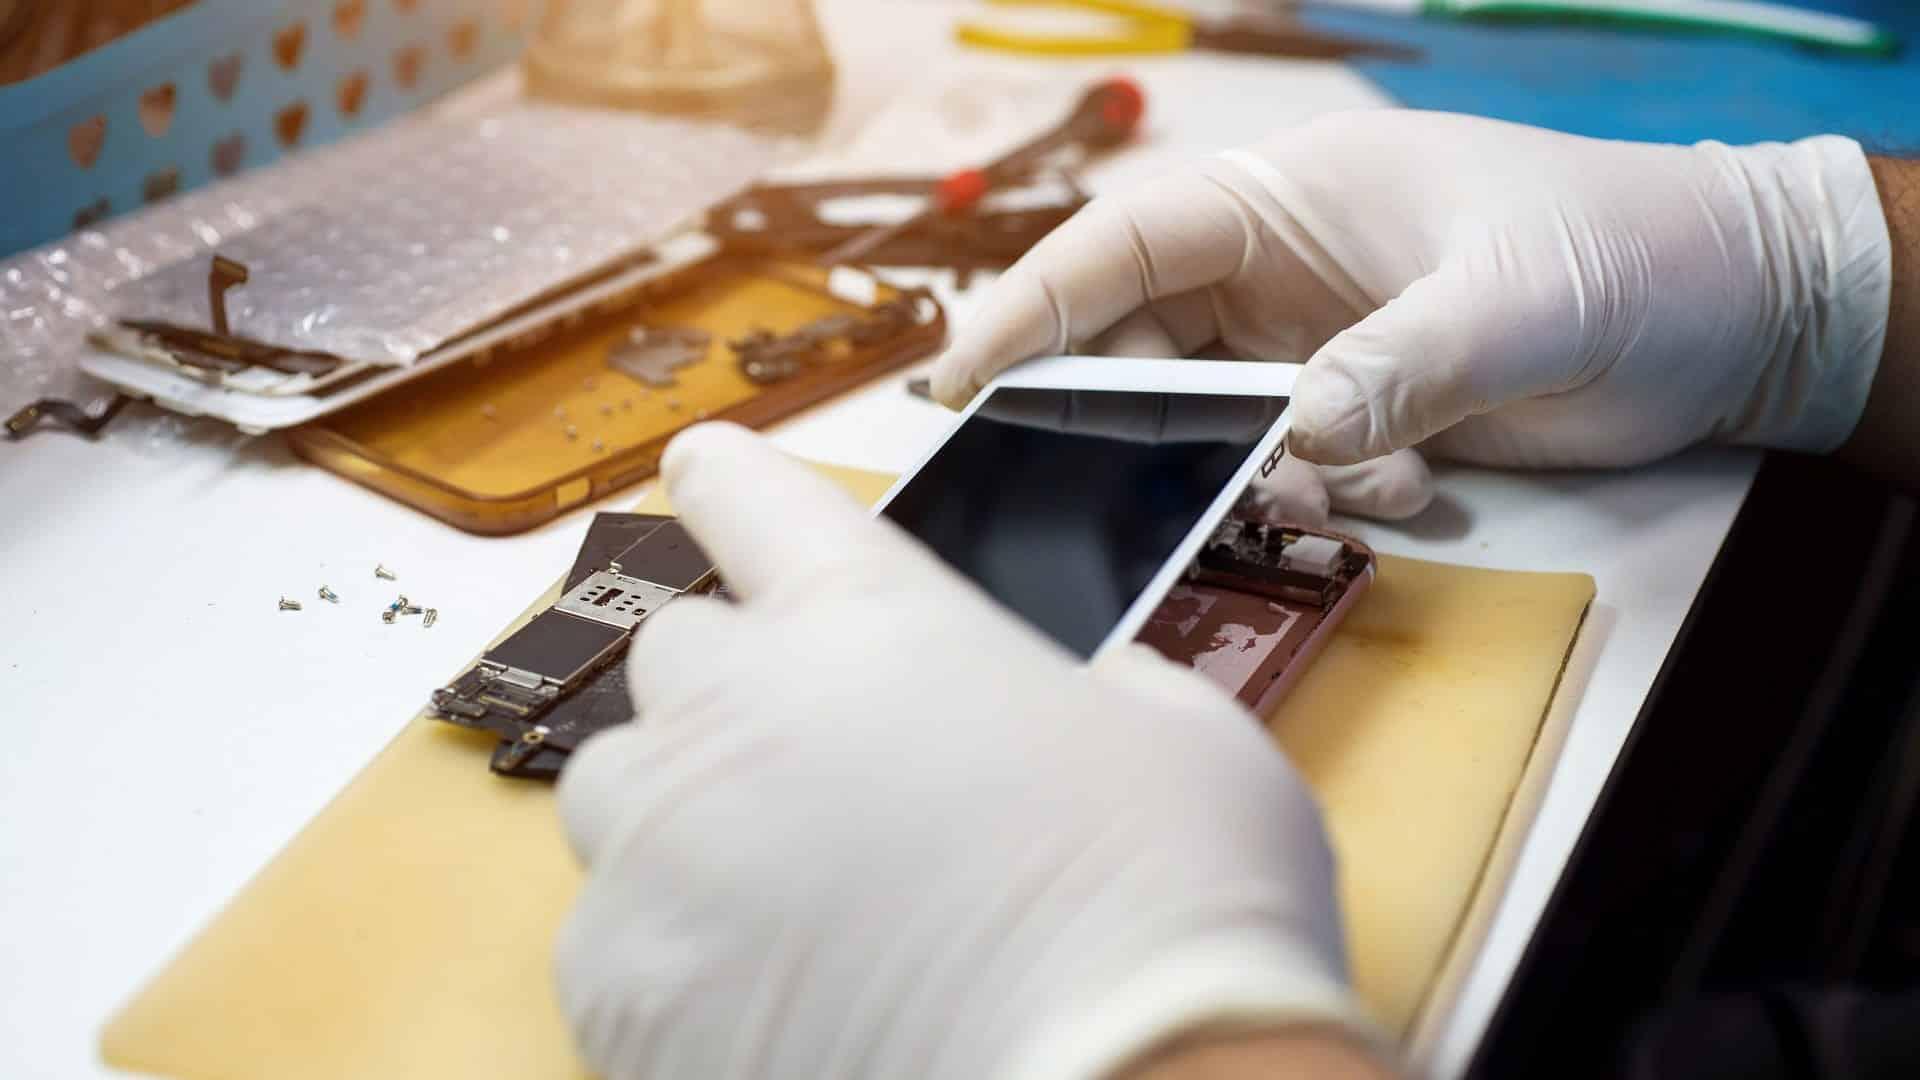 apple service center dubai for fixing iphone